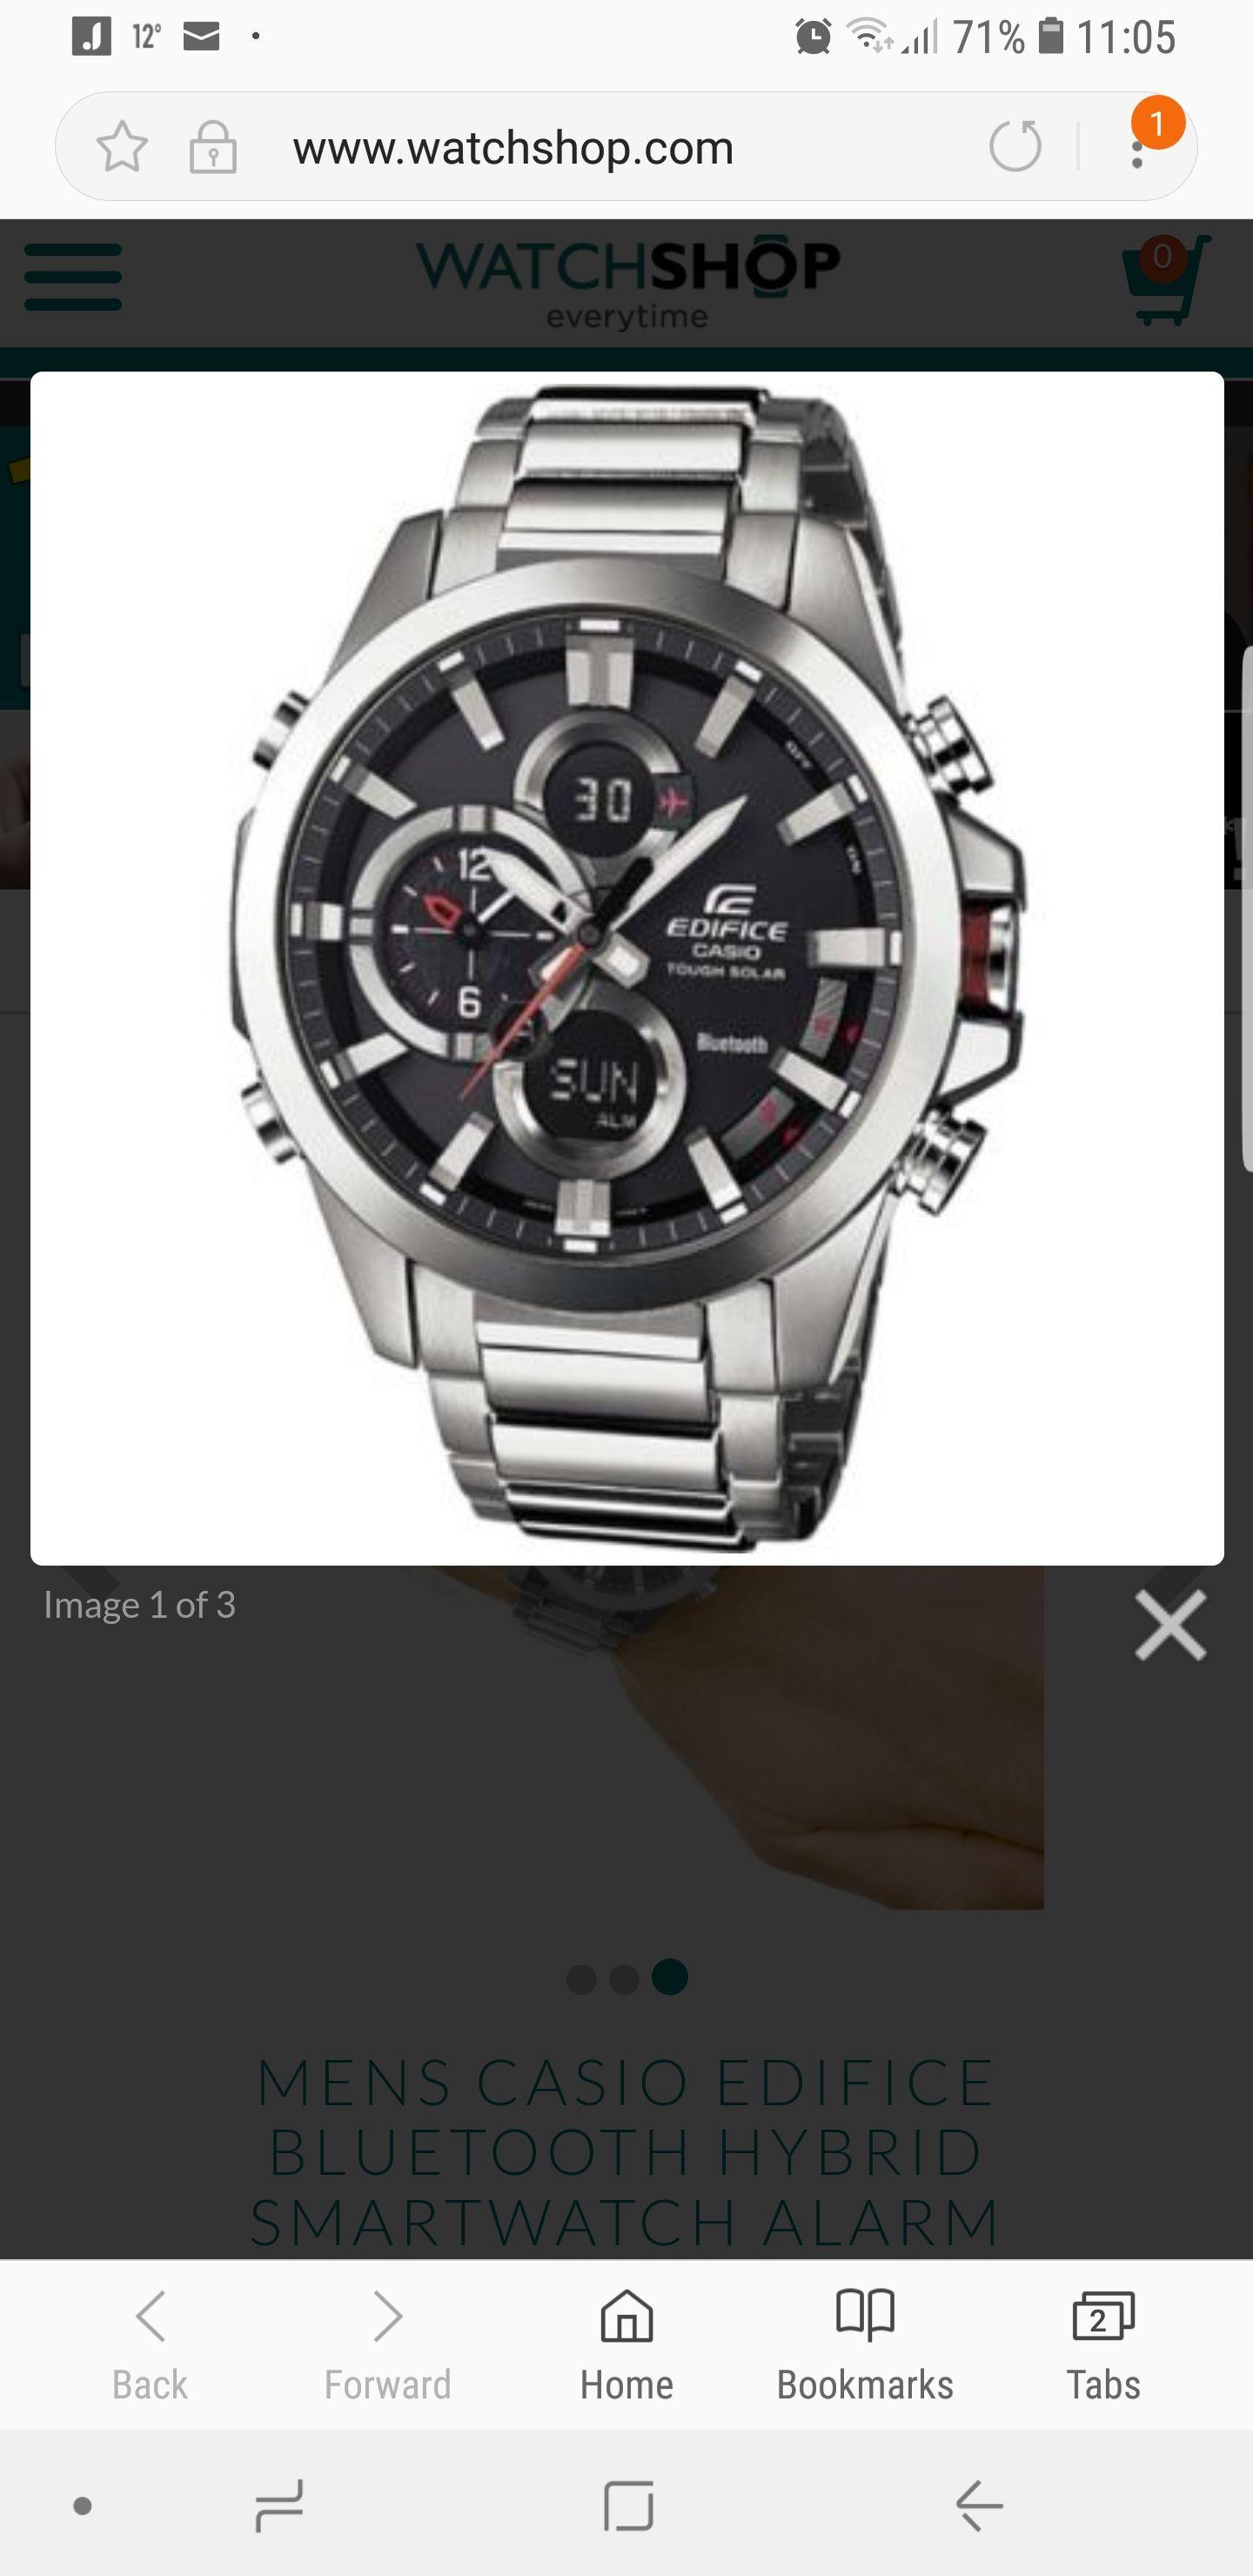 MENS CASIO EDIFICE BLUETOOTH HYBRID SMARTWATCH with code £135 @ Watch shop